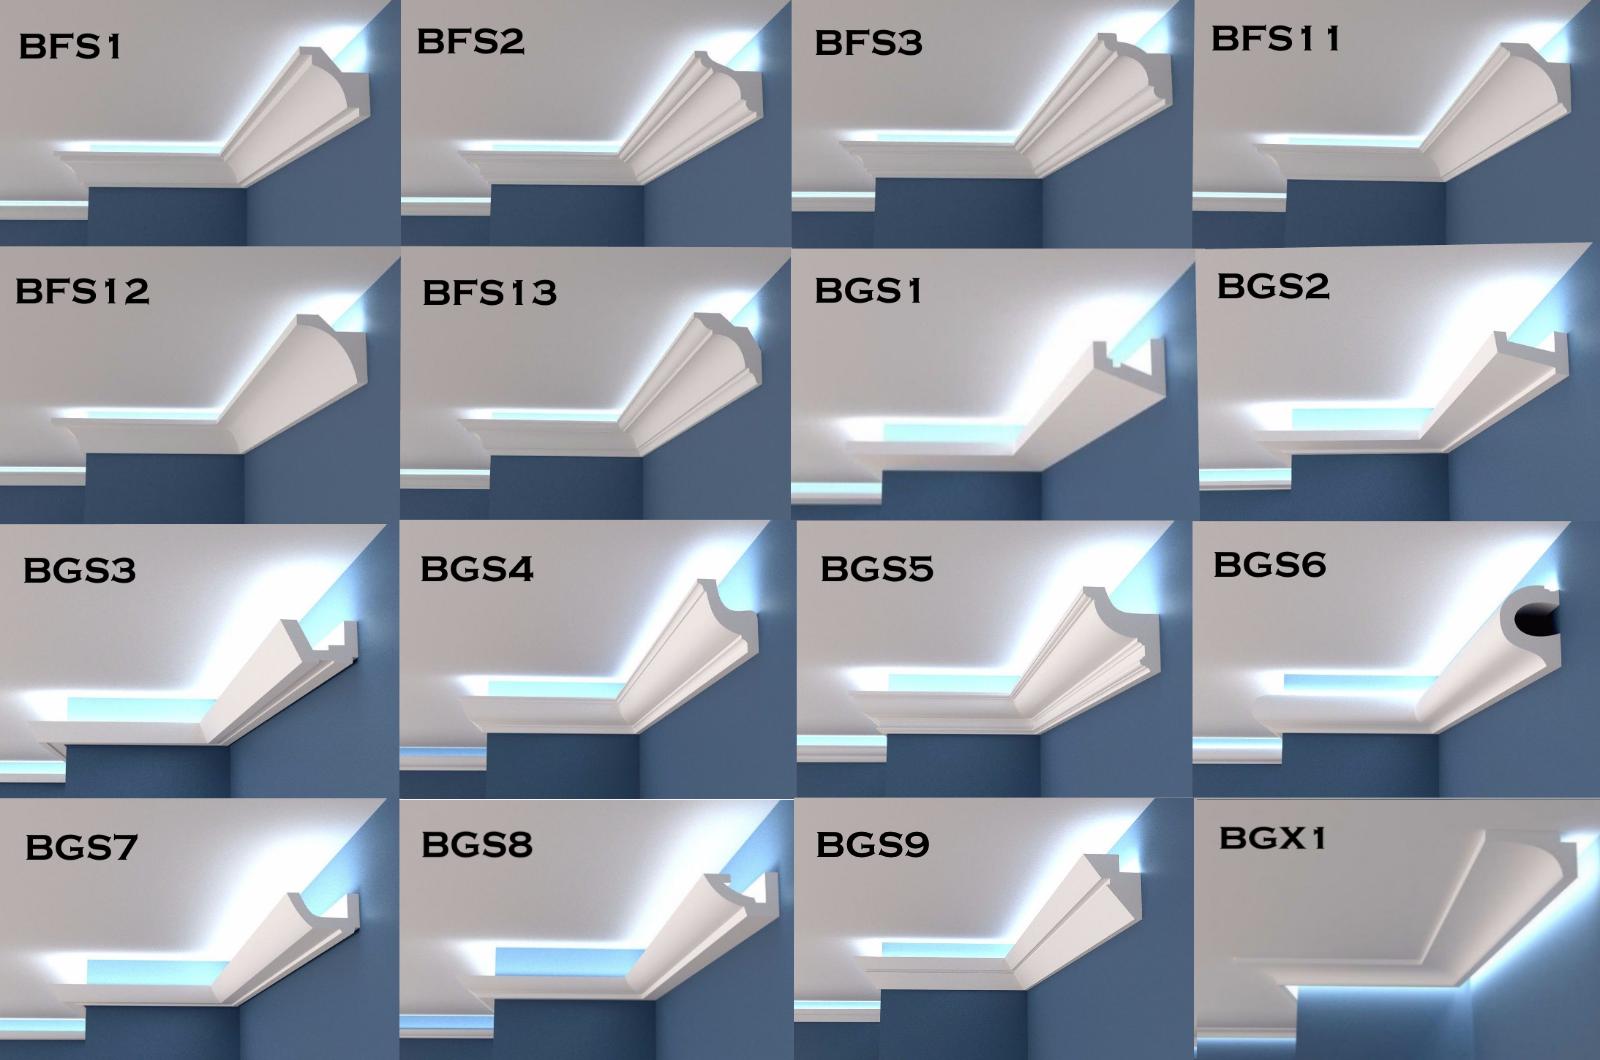 XPS BFS5 COVING LED Lighting molding cornice LOWEST PRICE LARGE SIZES QUALITY